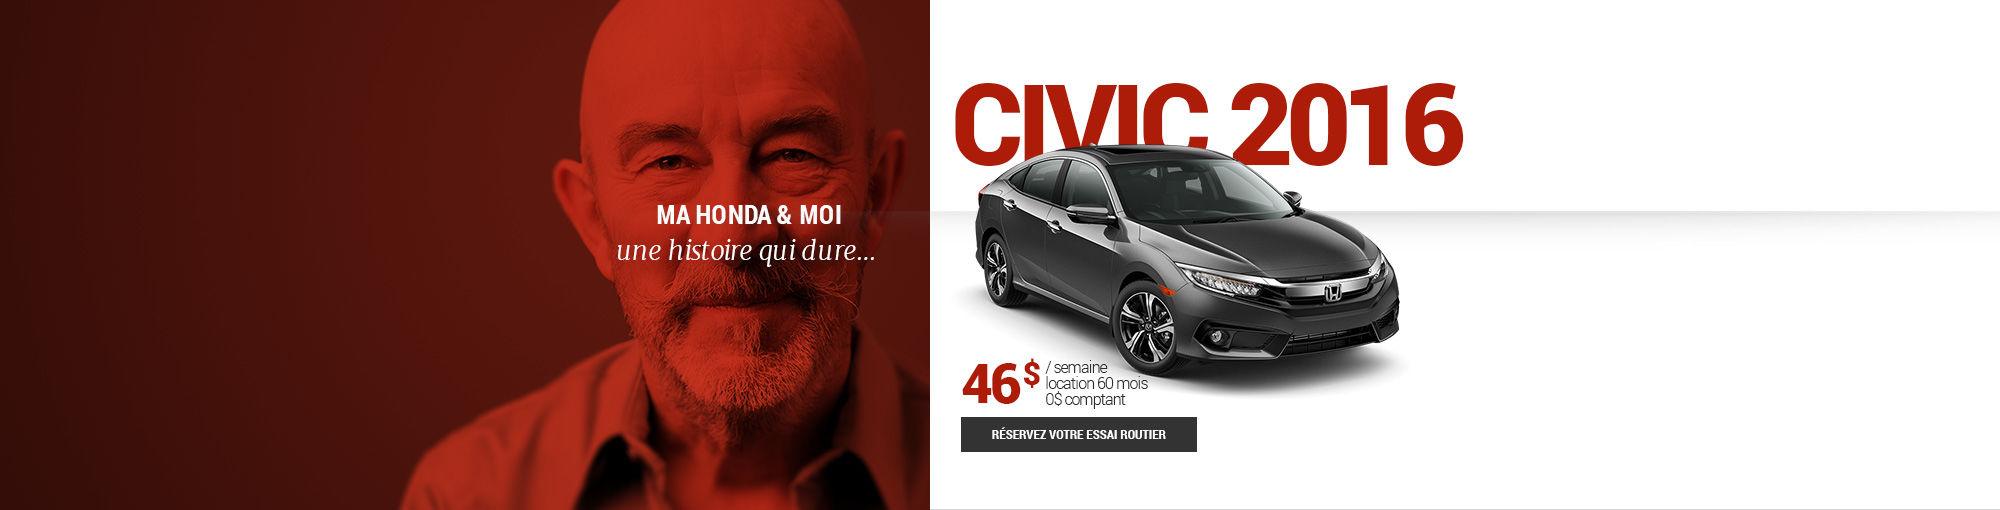 Civic 2016 - août-septembre 2016